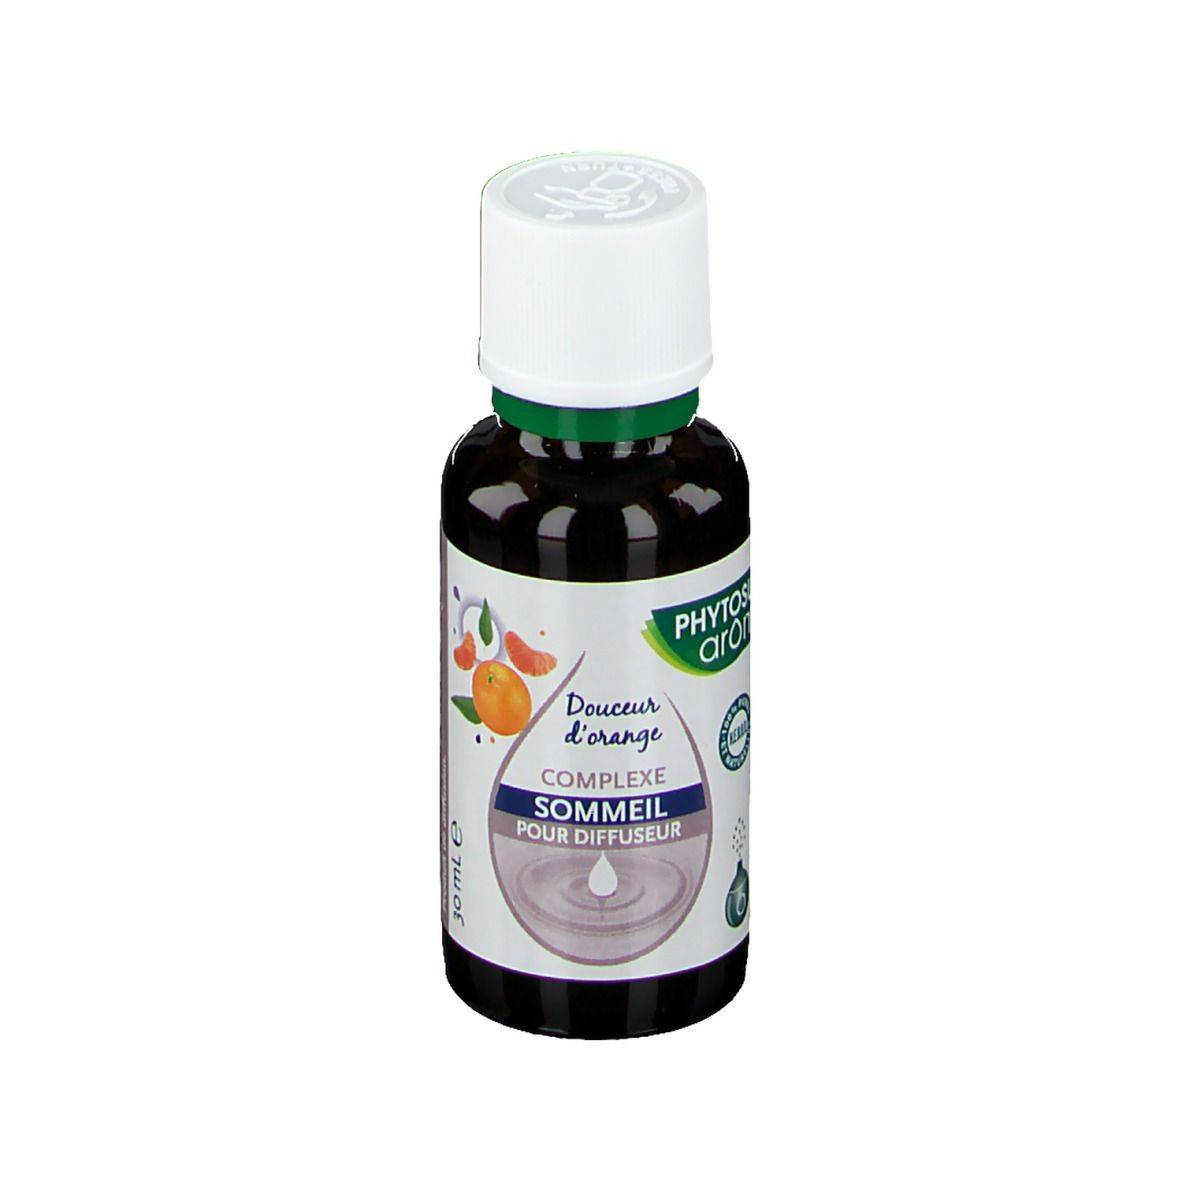 Phytosun arôms Phytosun Aroms huile essentielle complexe pour diffusion sommeil ml huile